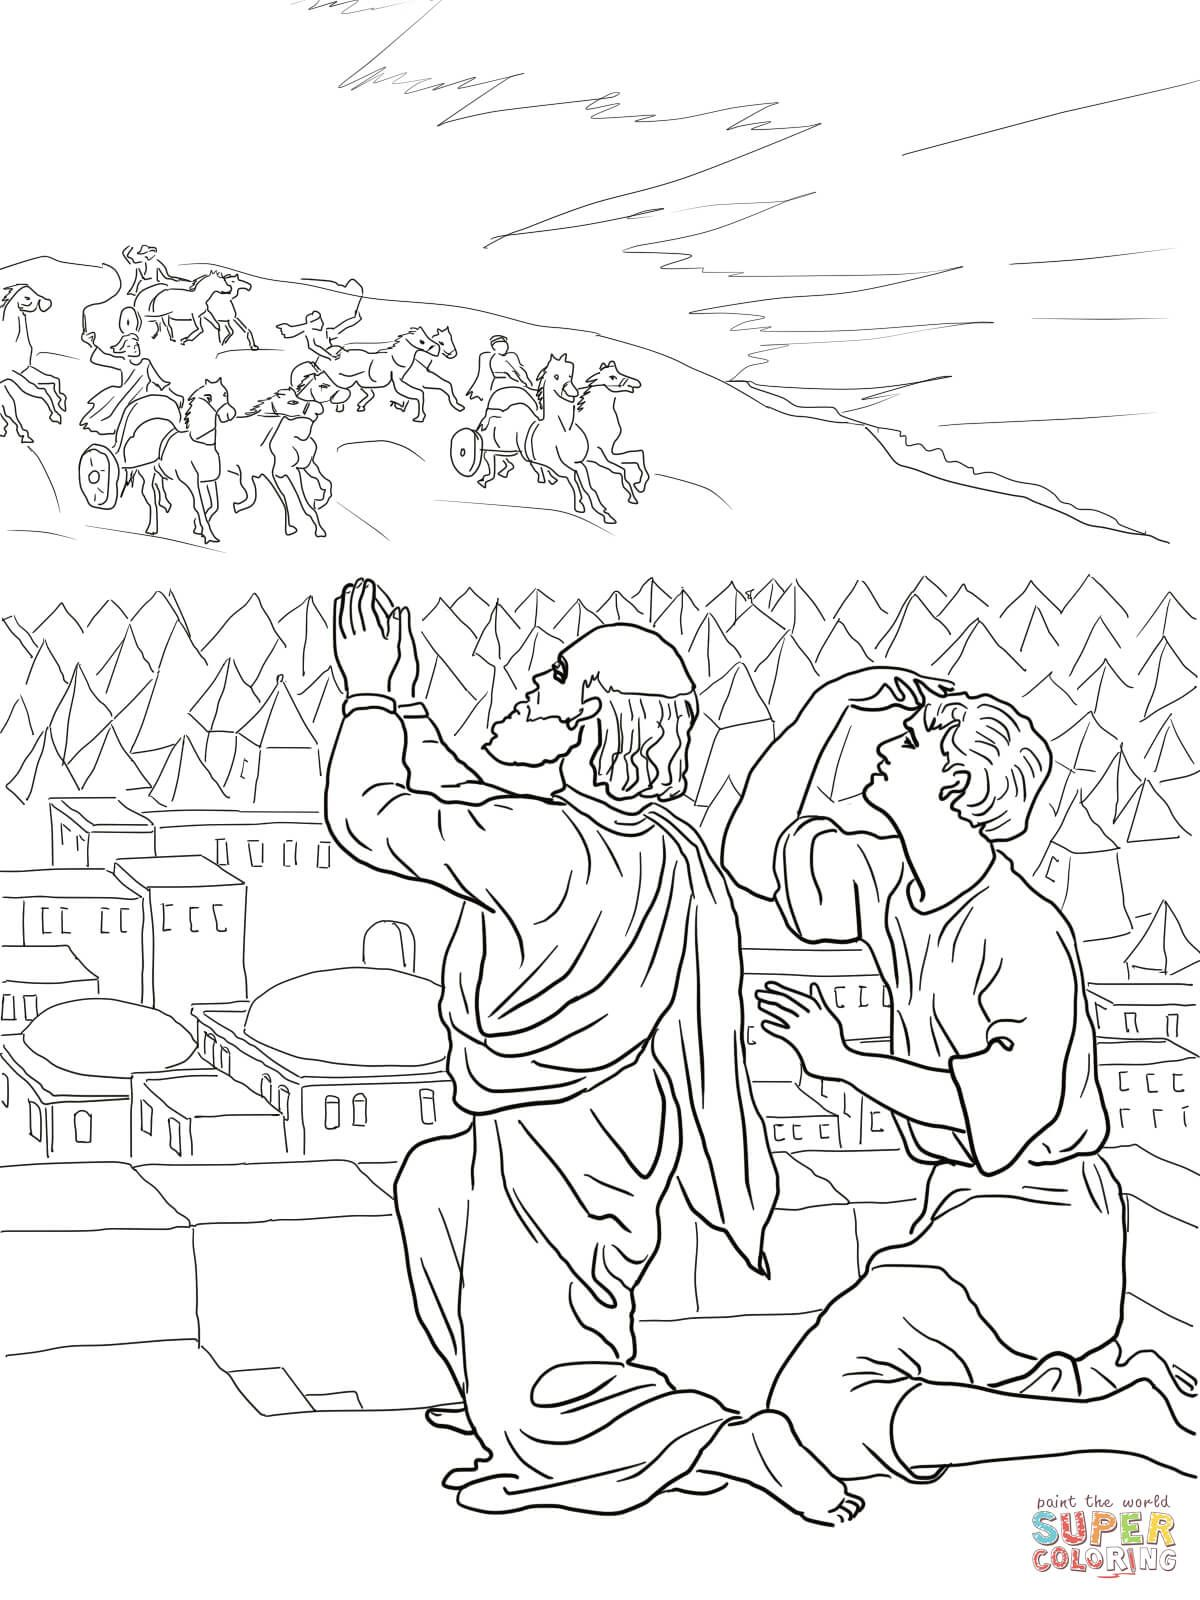 Elisha Fiery Army Coloring Page